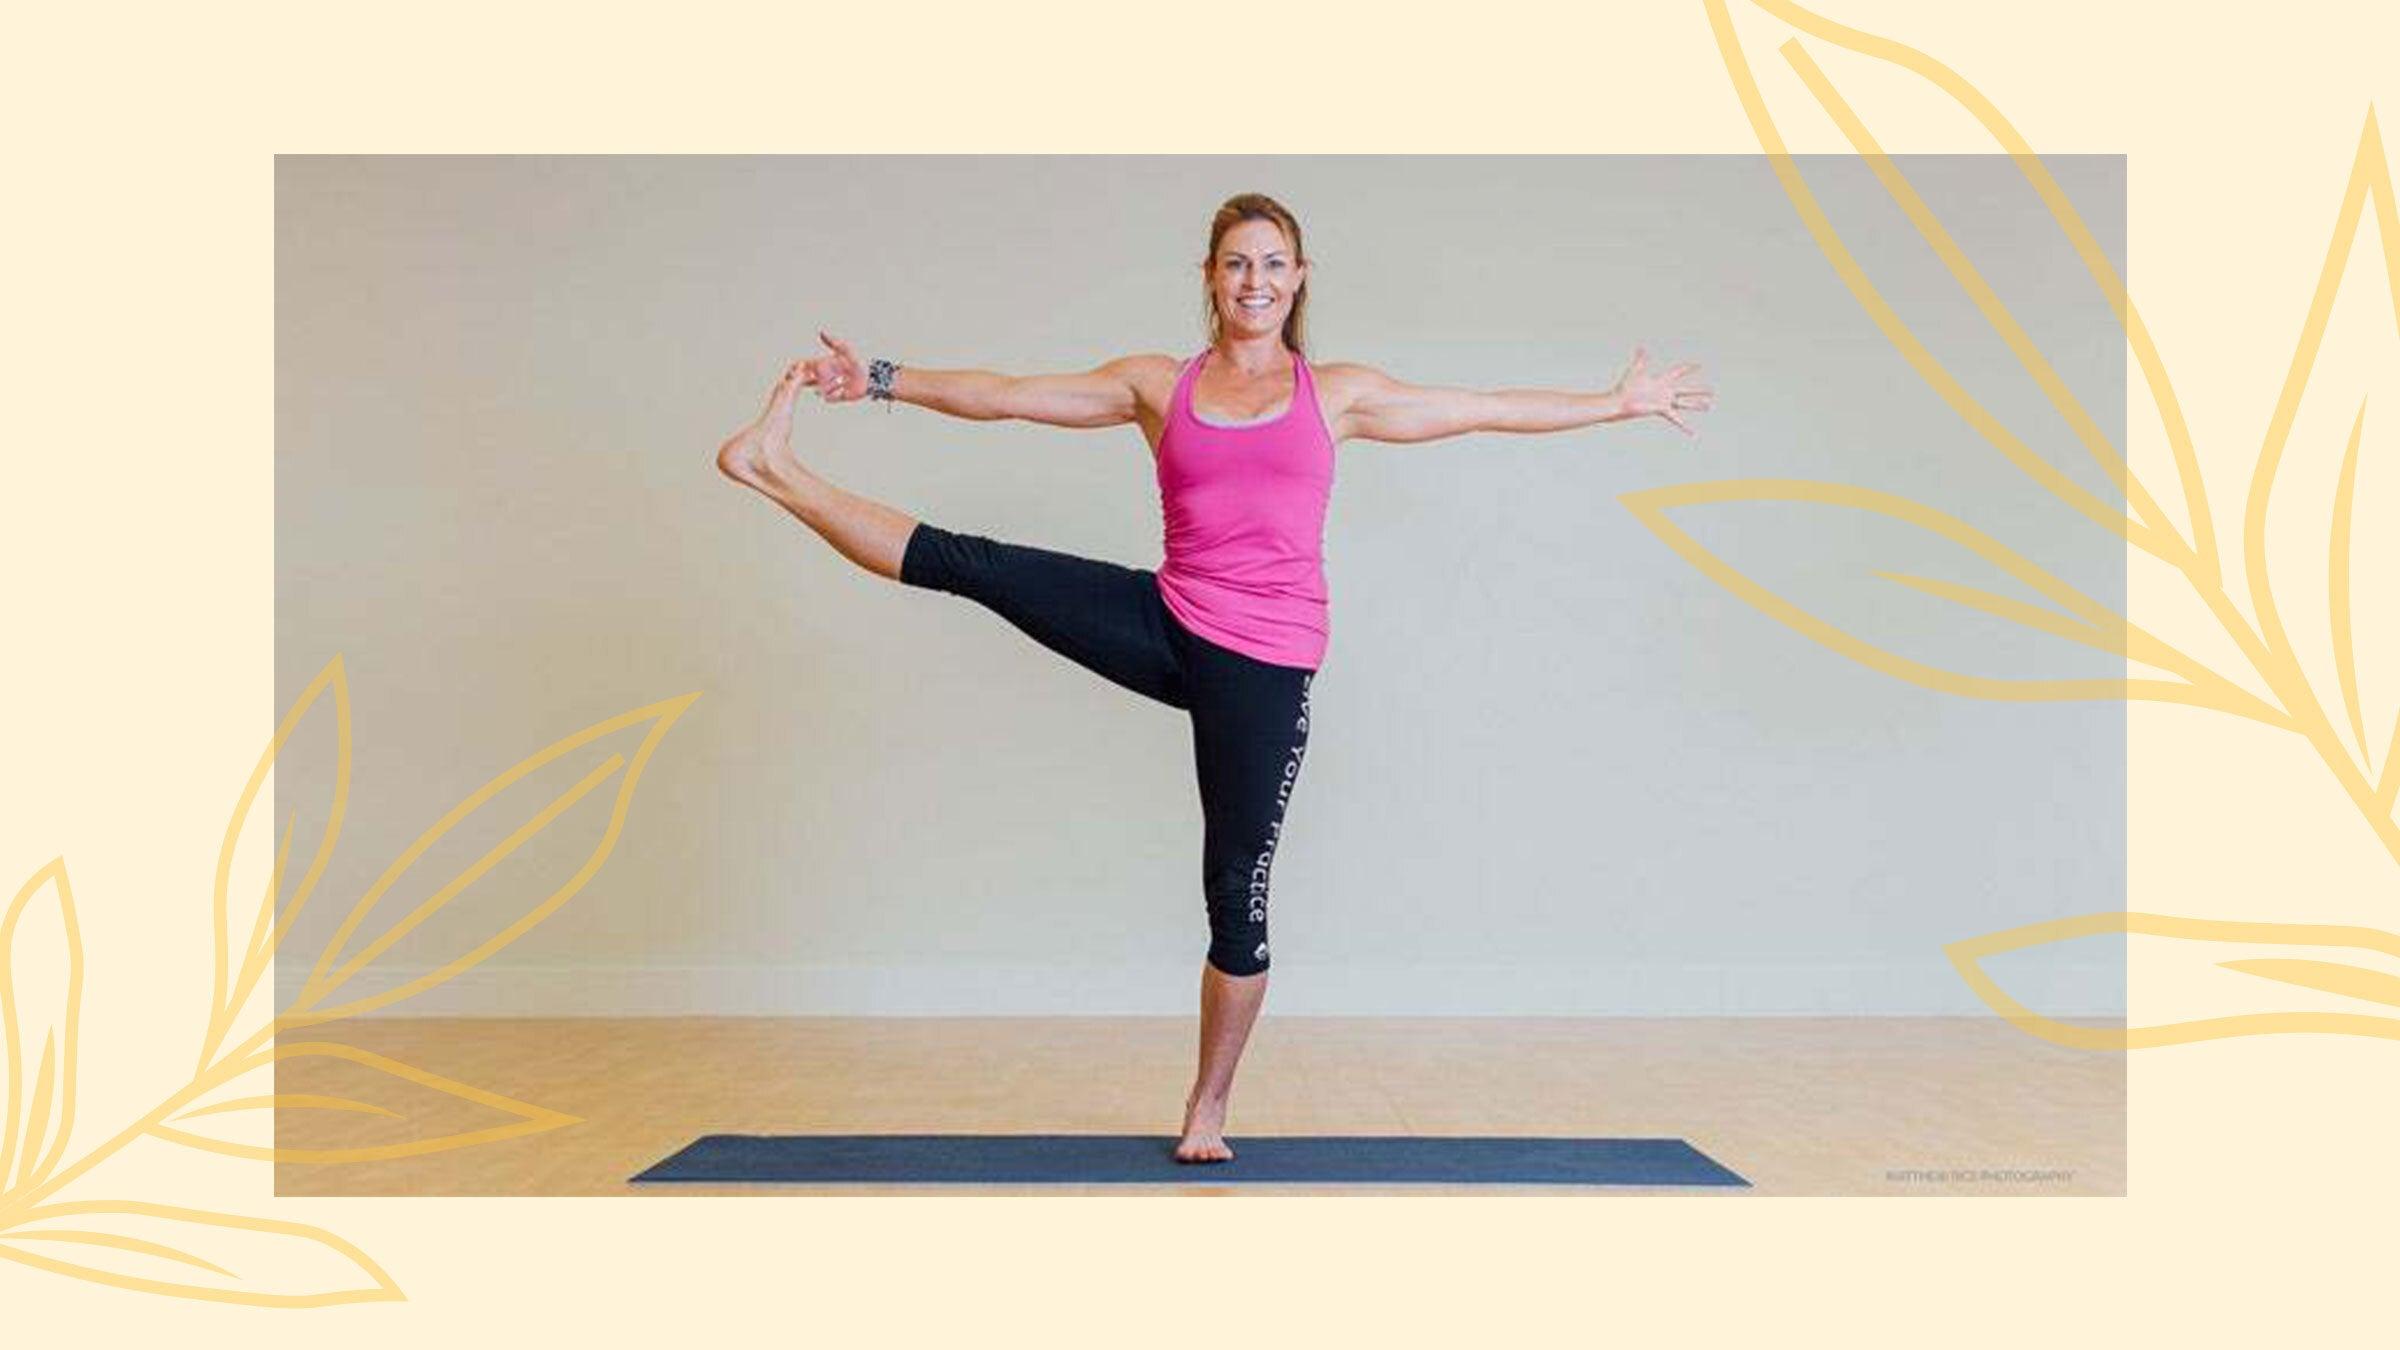 50 Yoga Poses Scientifically Proven To Improve Balance